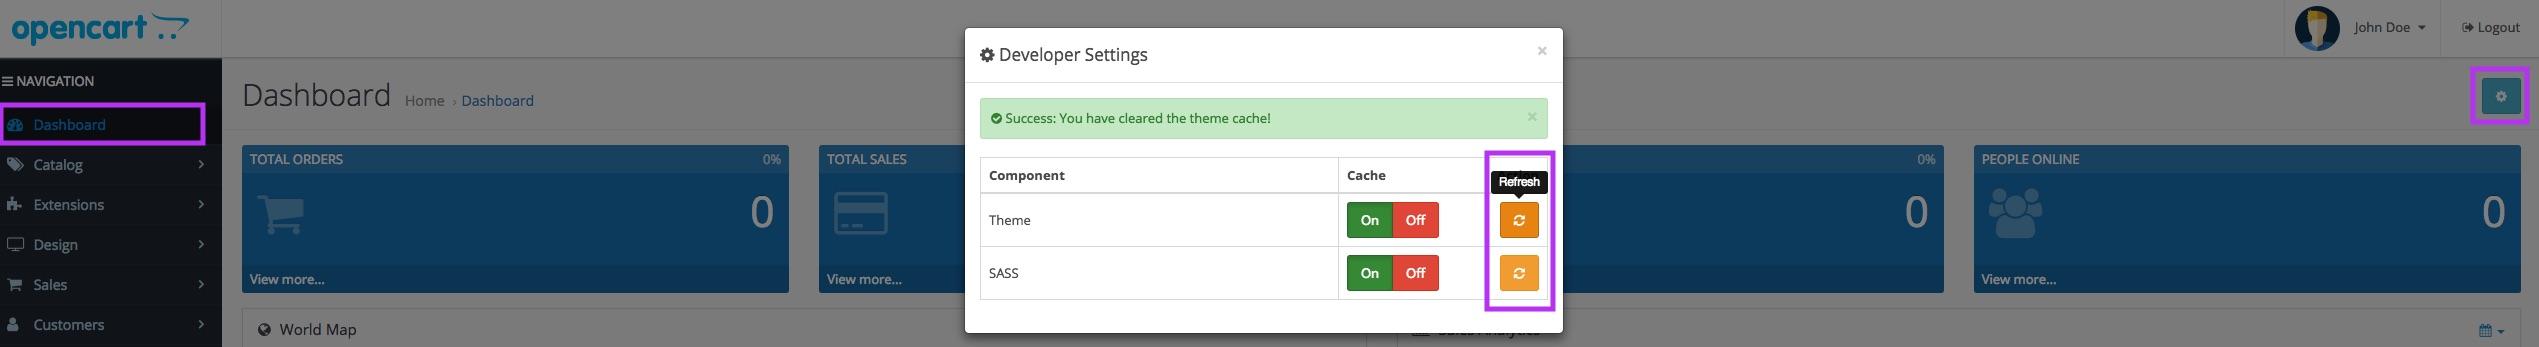 Trustpilot's free OpenCart plugin - download, install and configure